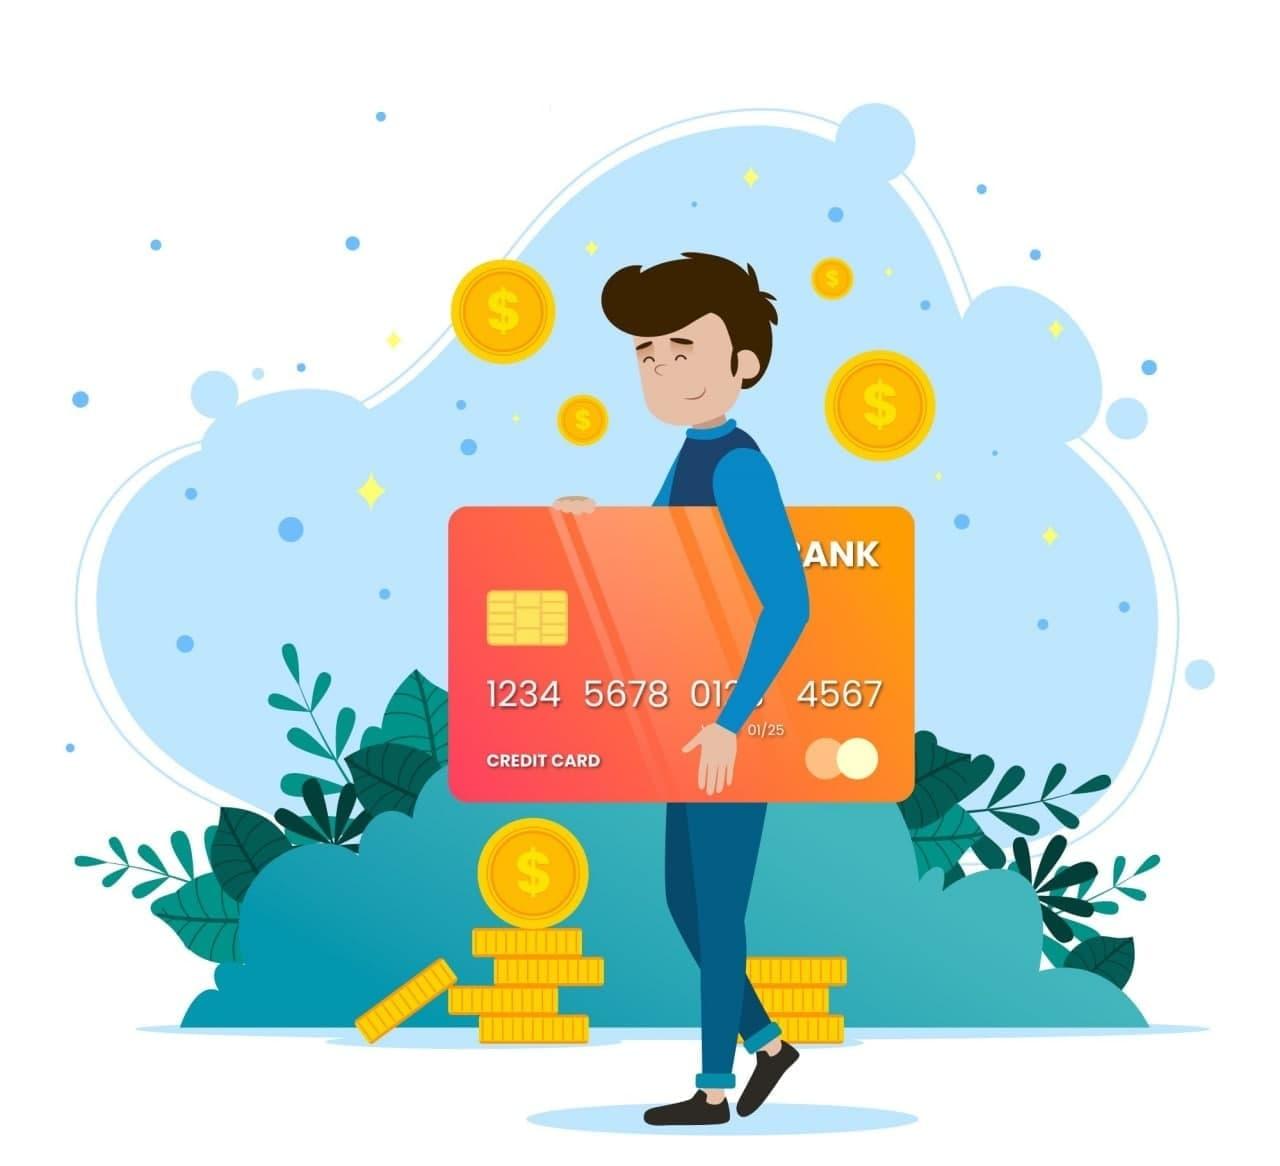 Credit Card Behind Credit